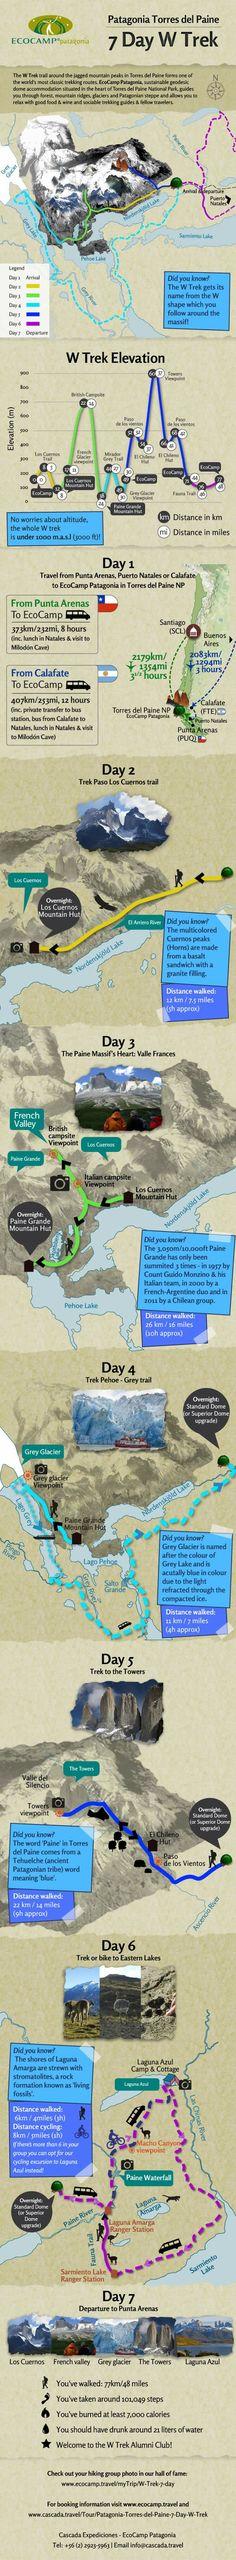 Patagonia Torres del Paine 7 Day W Trek Infographic.